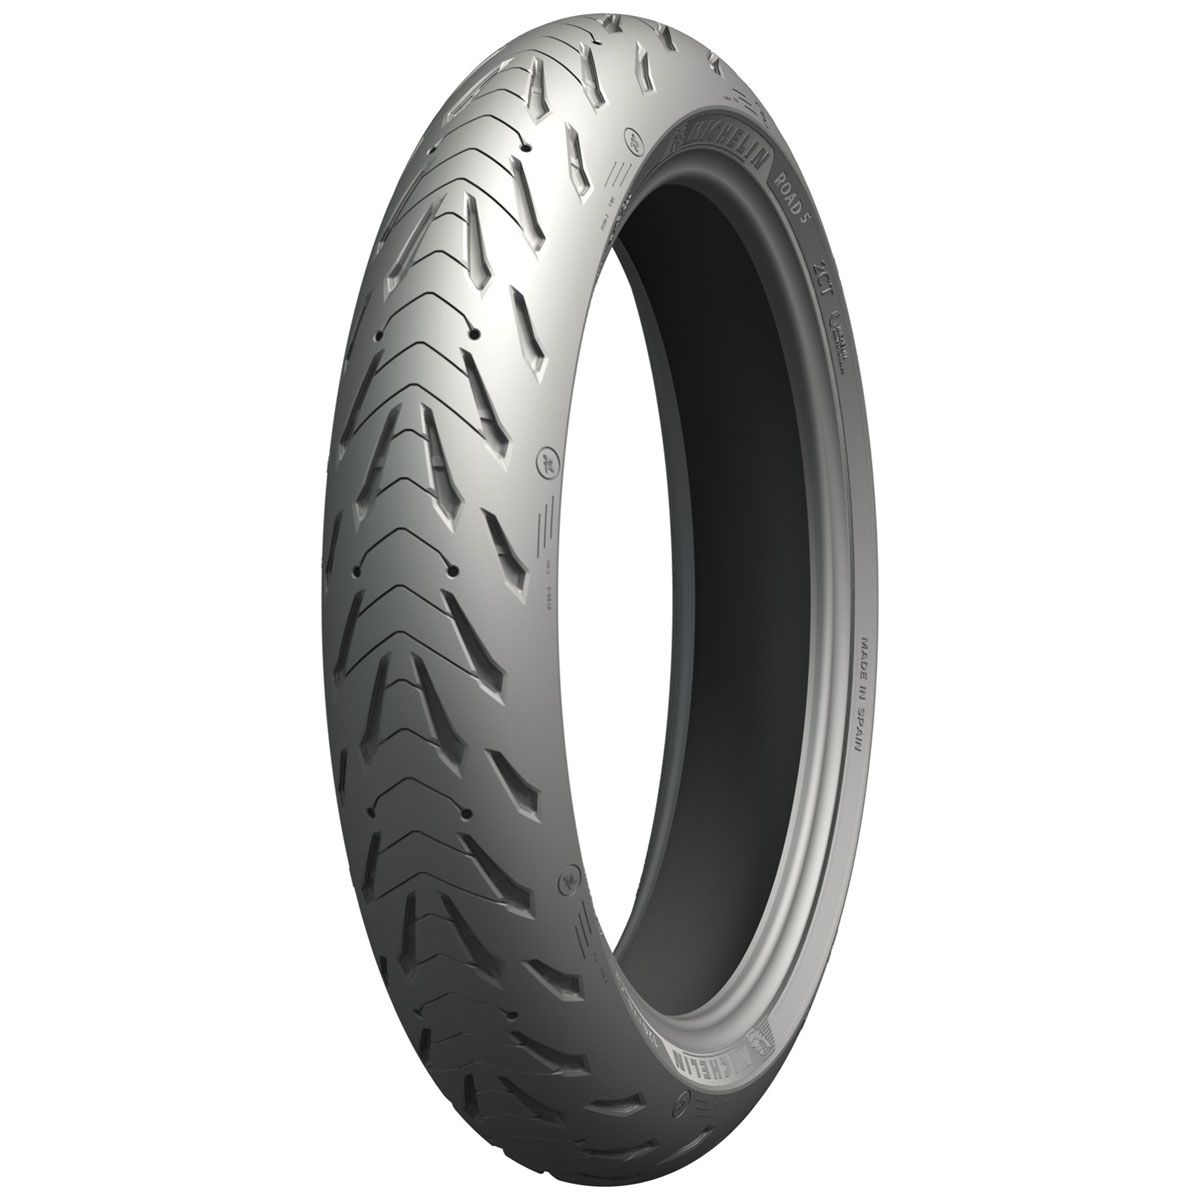 Michelin Road 5 110/70ZR17 Front Tire